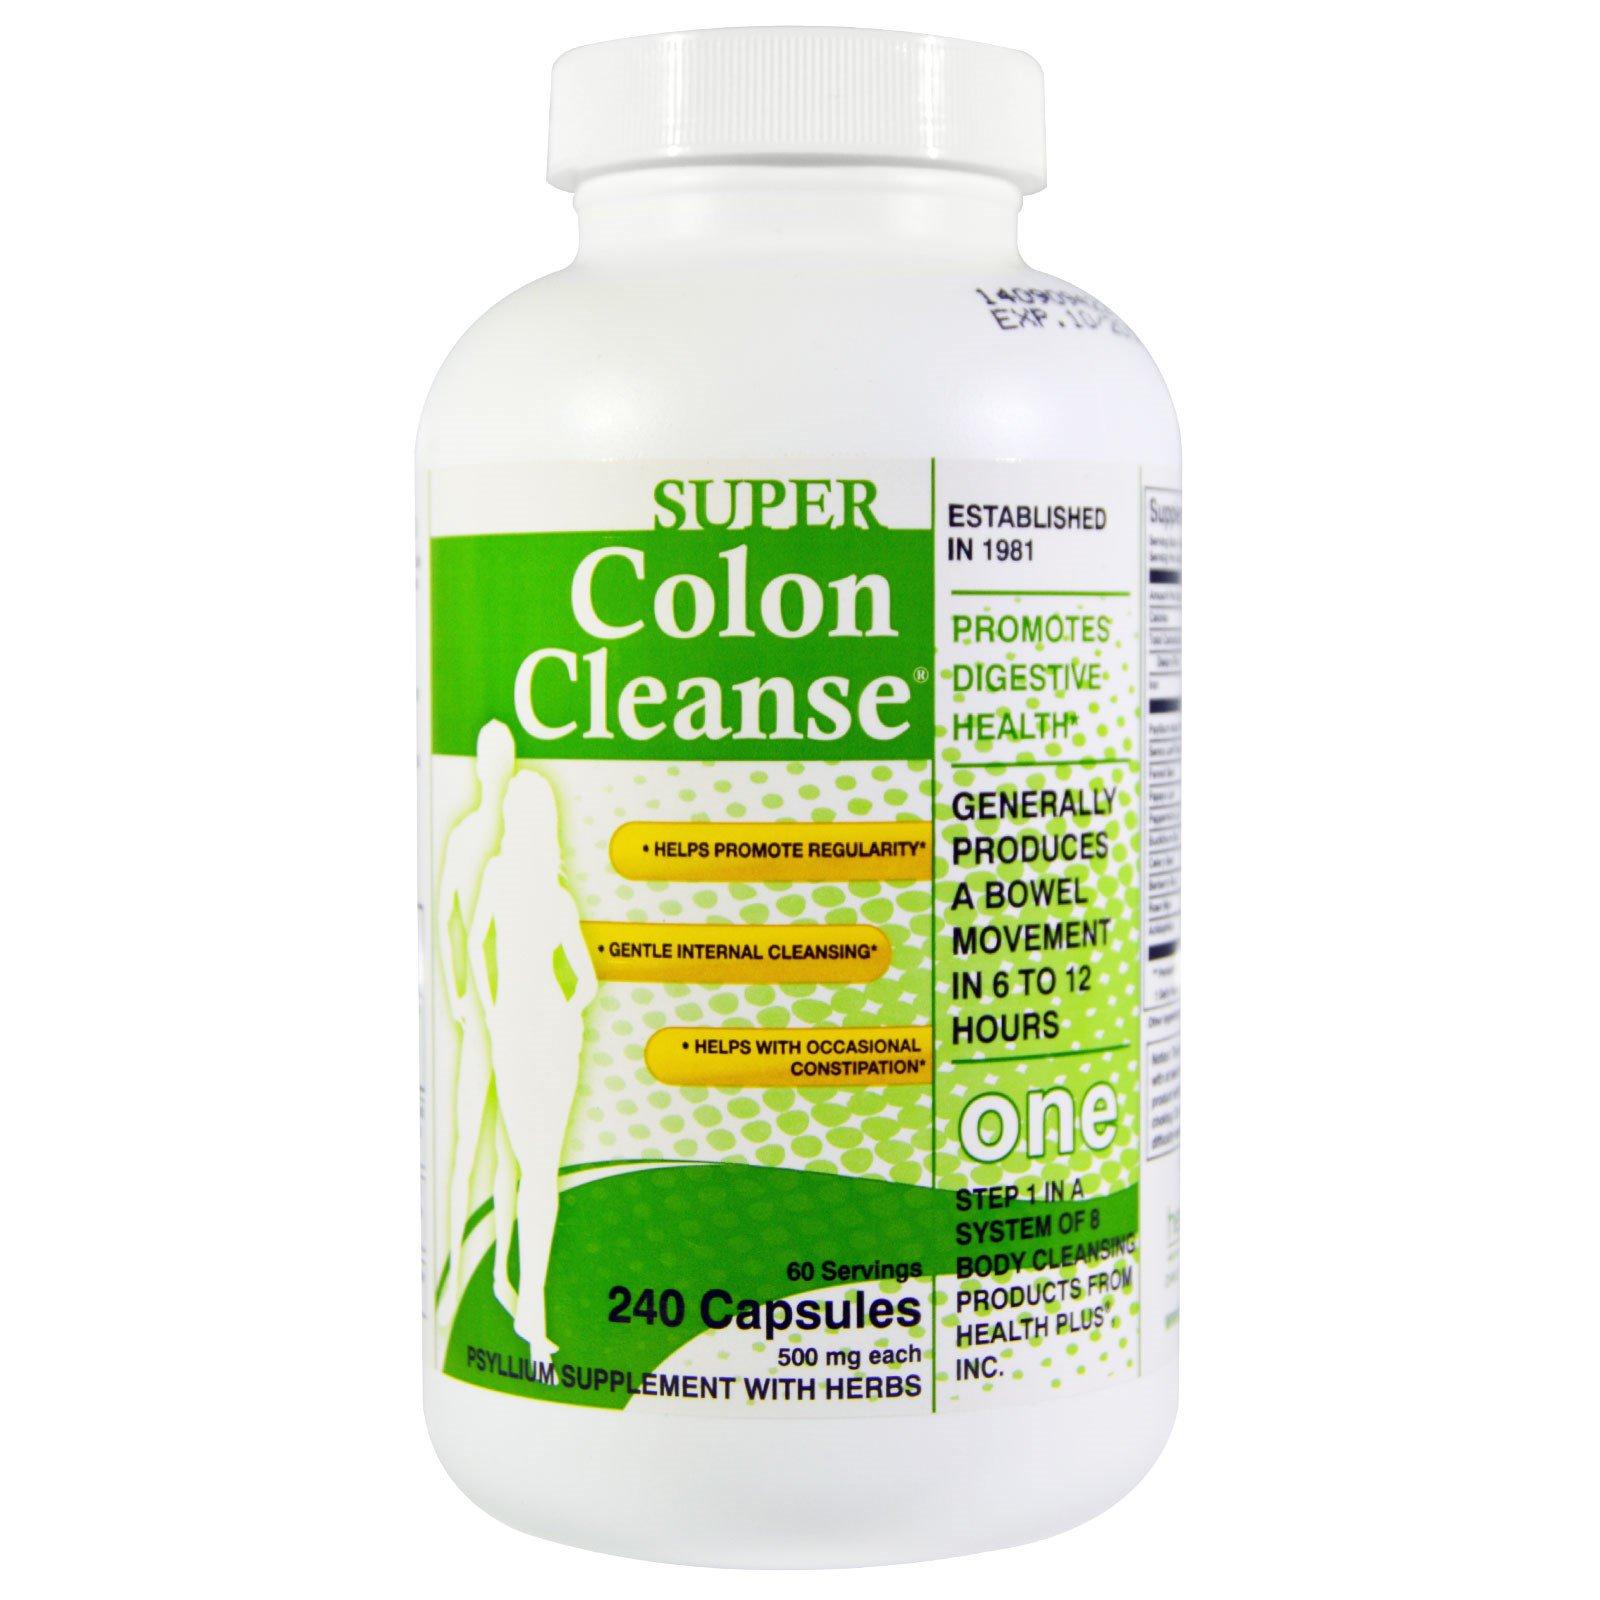 health plus inc super colon cleanse 500 mg 240 capsules. Black Bedroom Furniture Sets. Home Design Ideas